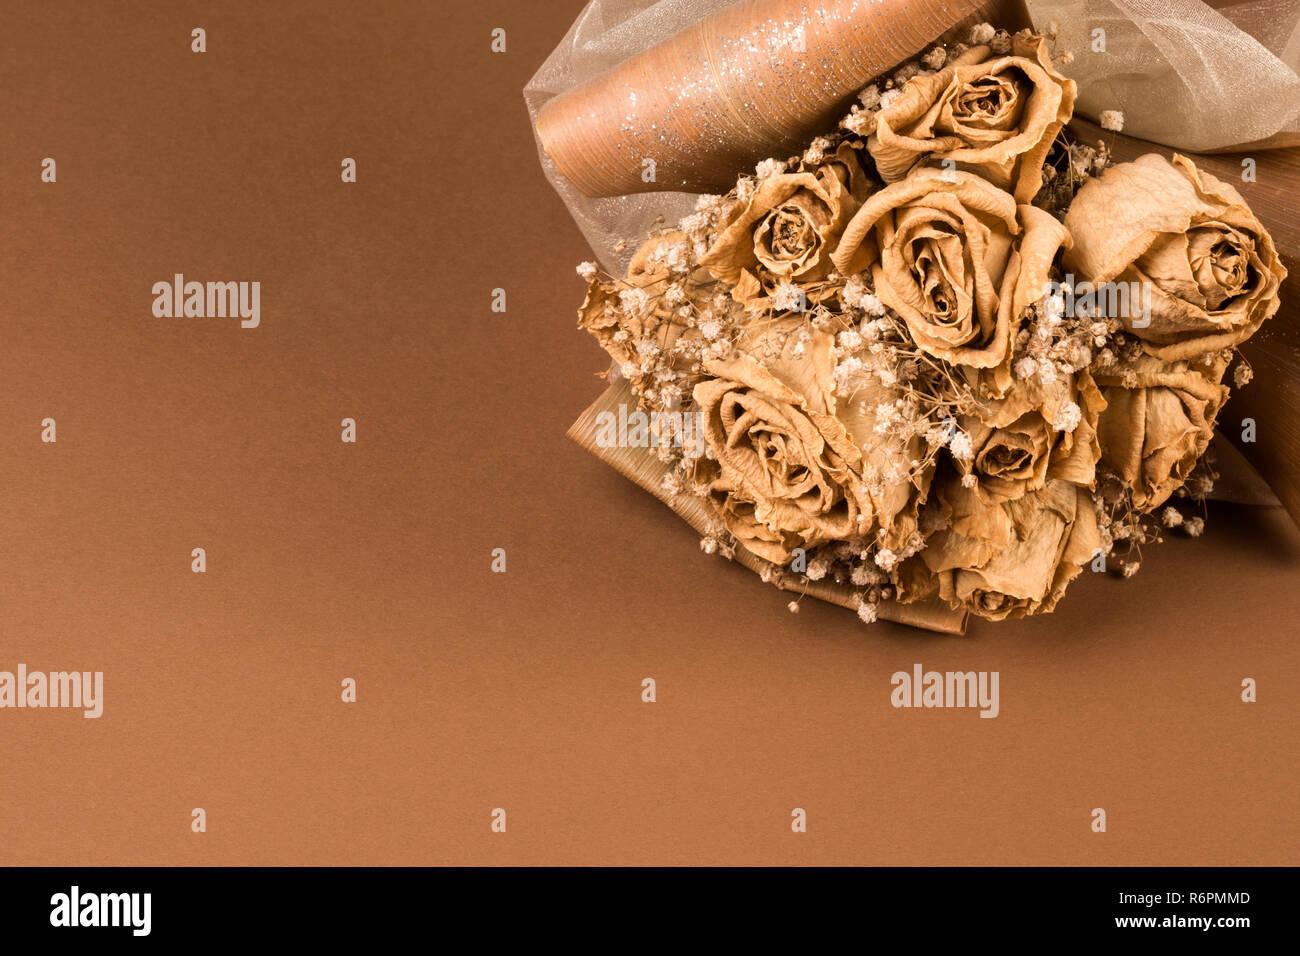 Getrocknete Hochzeitsstrauss Stockfoto Bild 227921917 Alamy